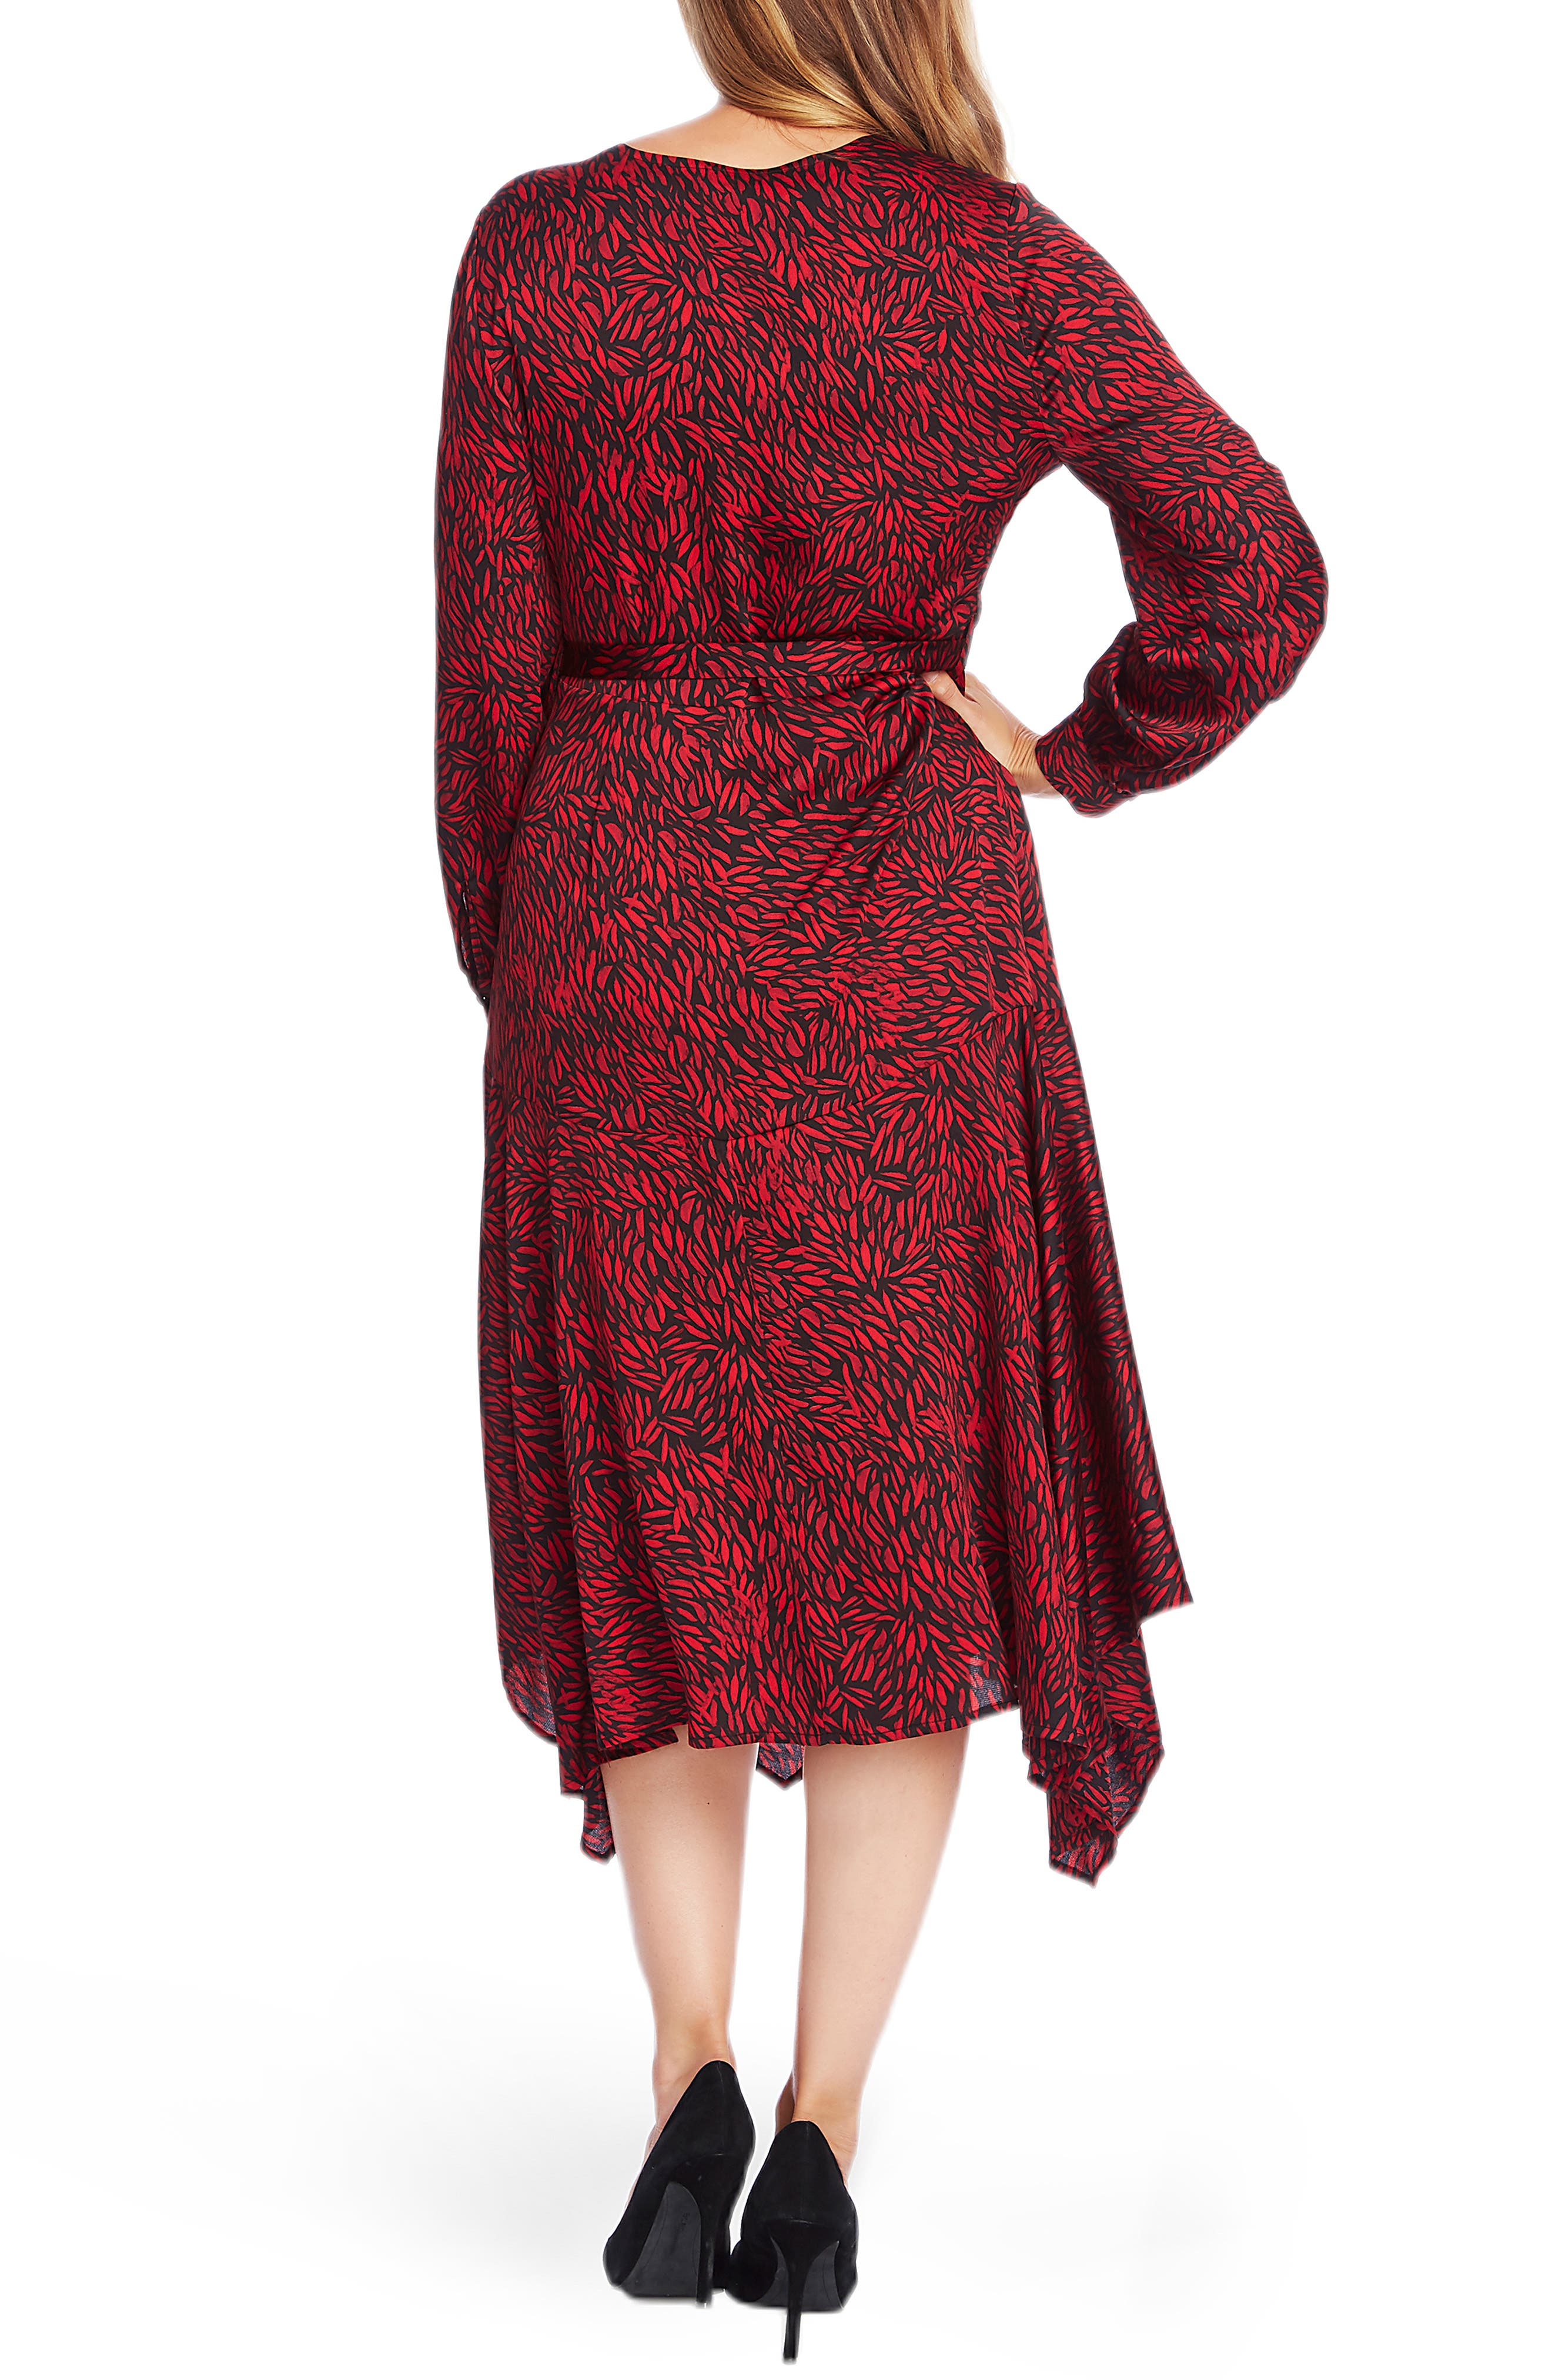 Vince Camuto Dresses Drifting Petals Long Sleeve Faux Wrap Dress